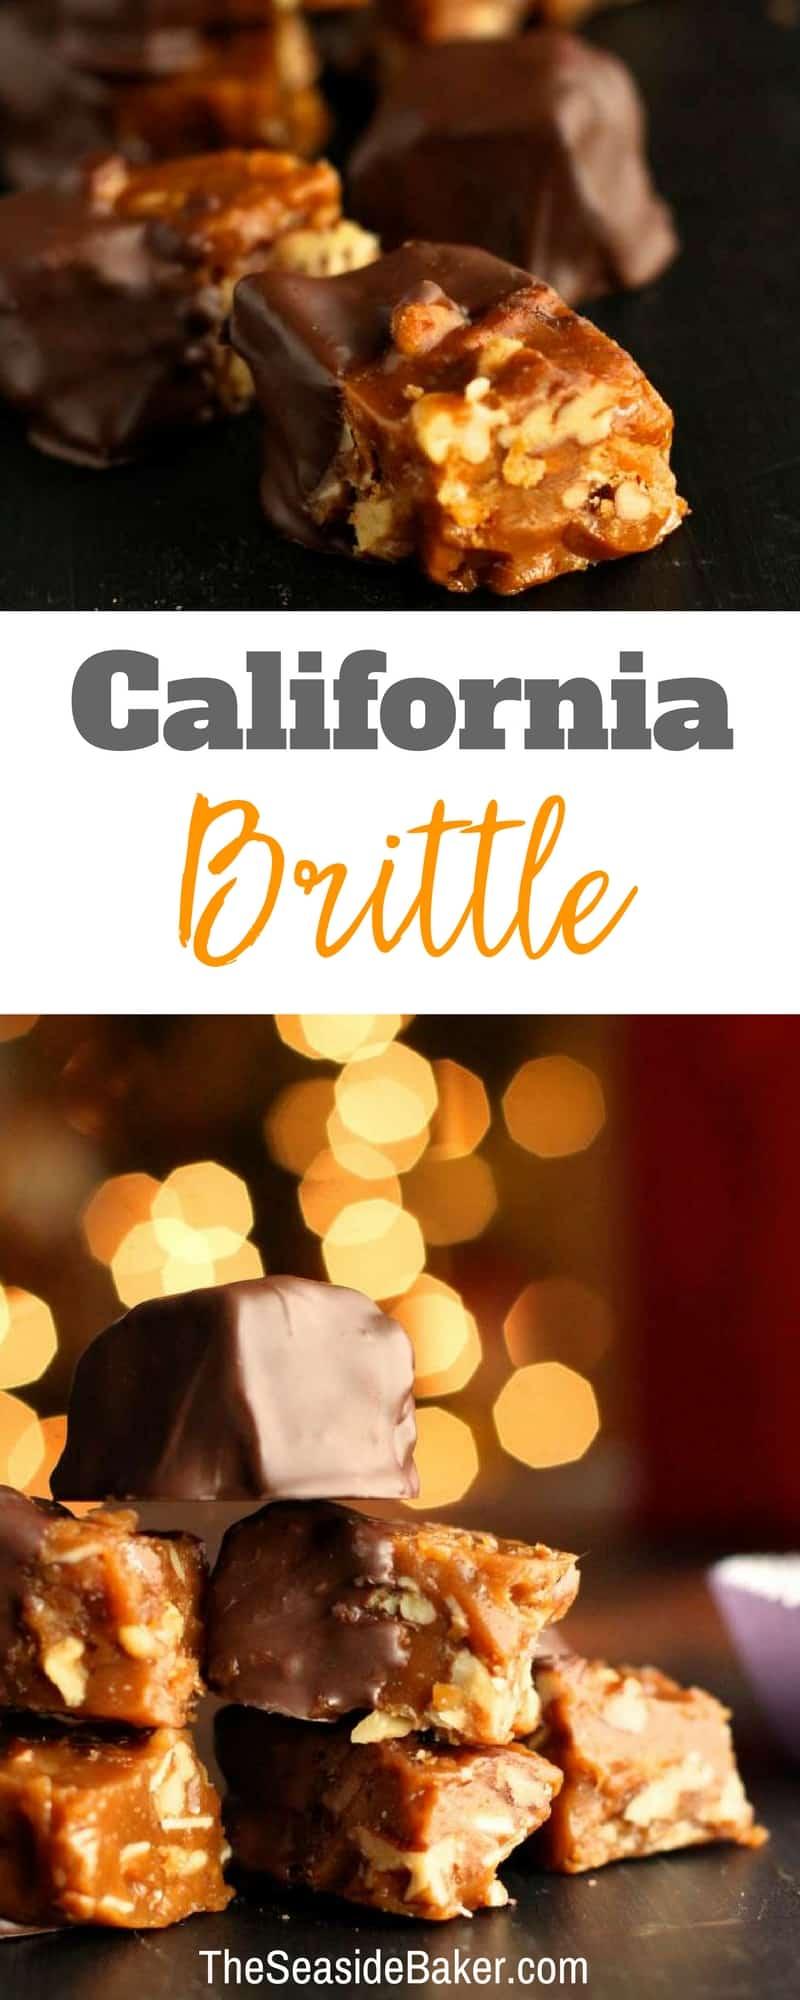 Homemade California Brittle